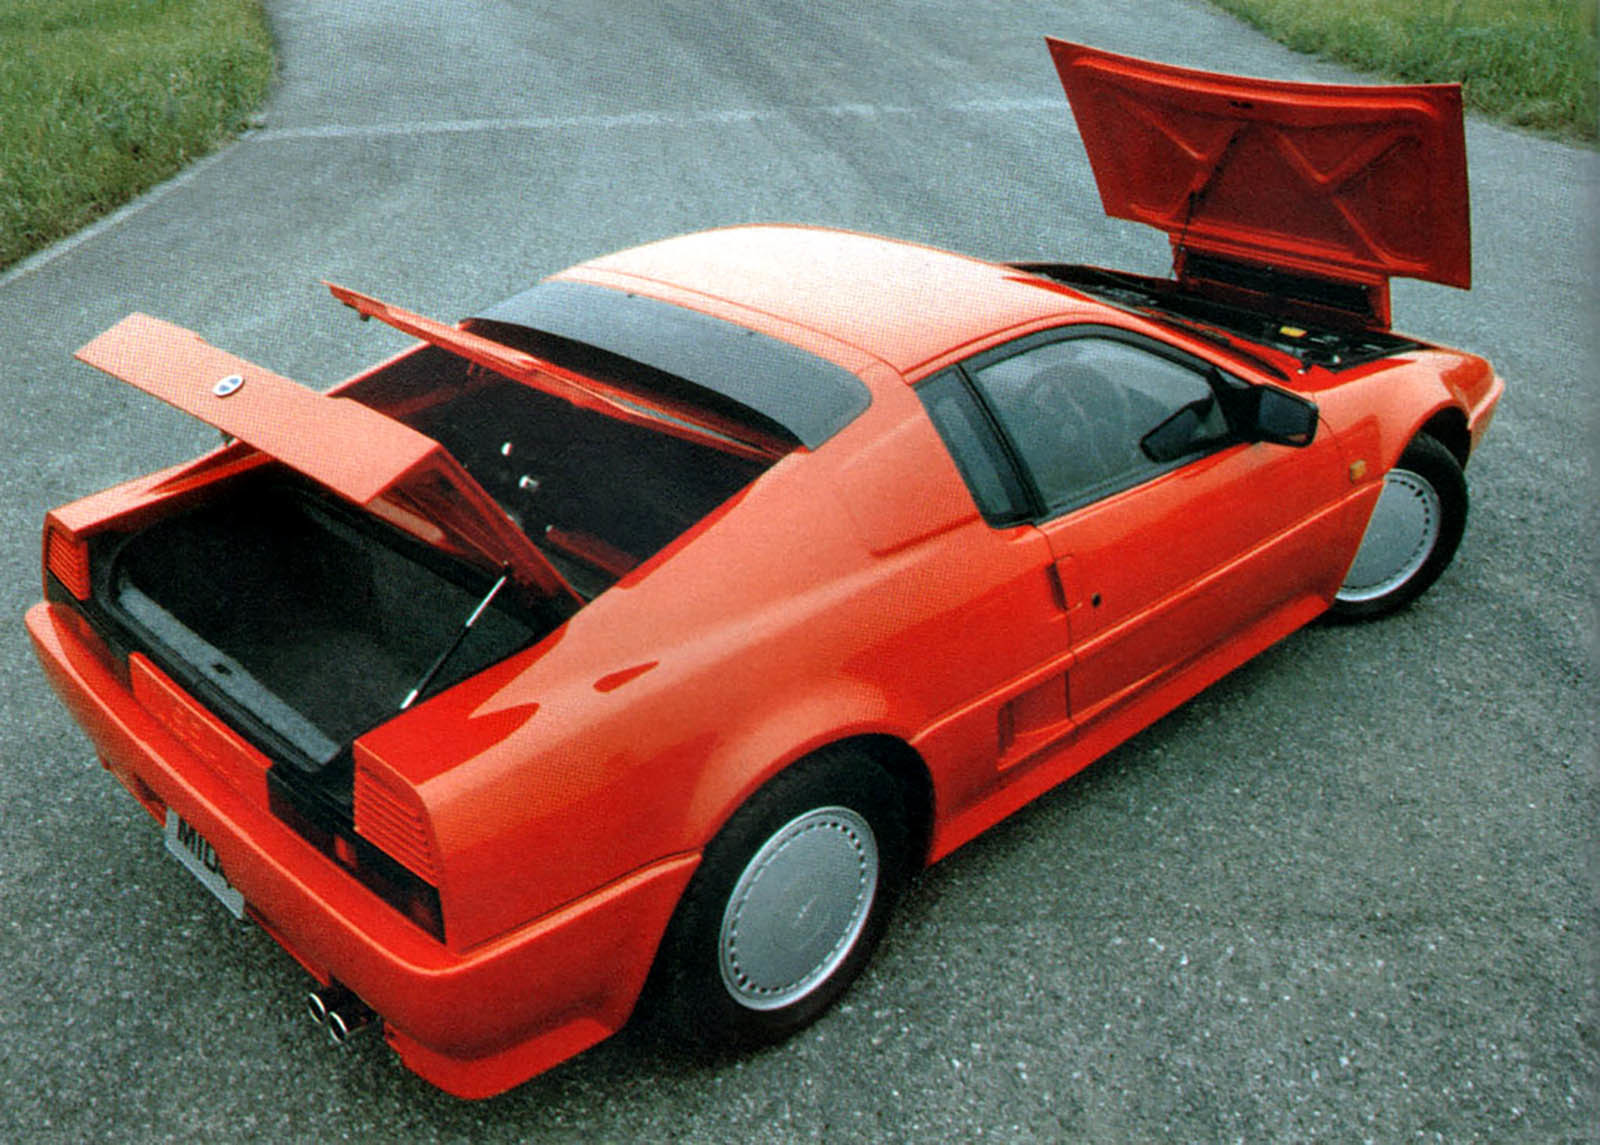 Foto de Nissan MID-4 Concept 1985 (12/12)